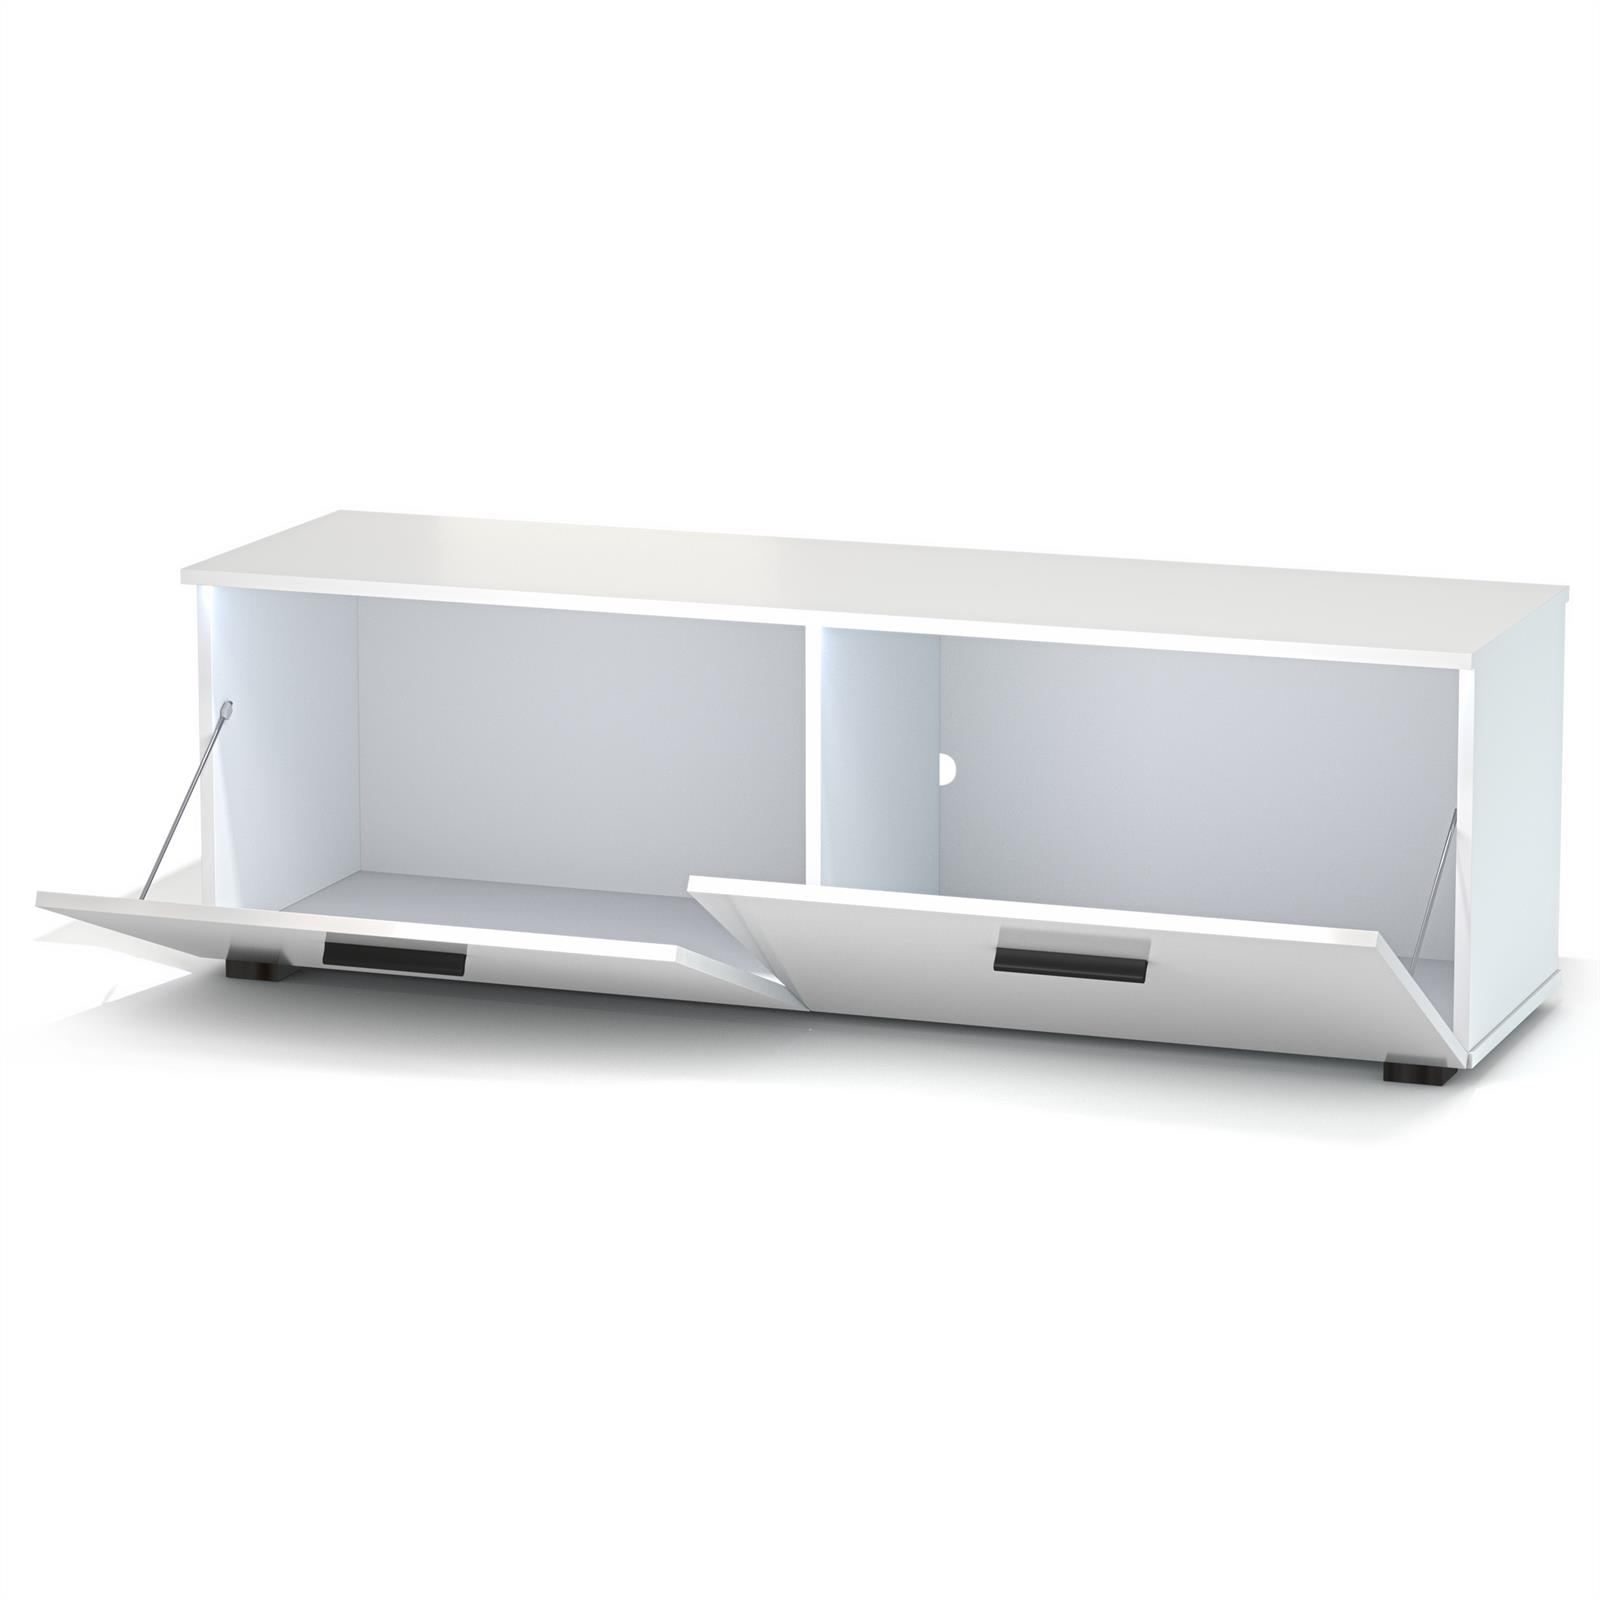 tv lowboard in wei mit led beleuchtung 138 cm fernseh schrank rack m bel tisch eur 99 95. Black Bedroom Furniture Sets. Home Design Ideas